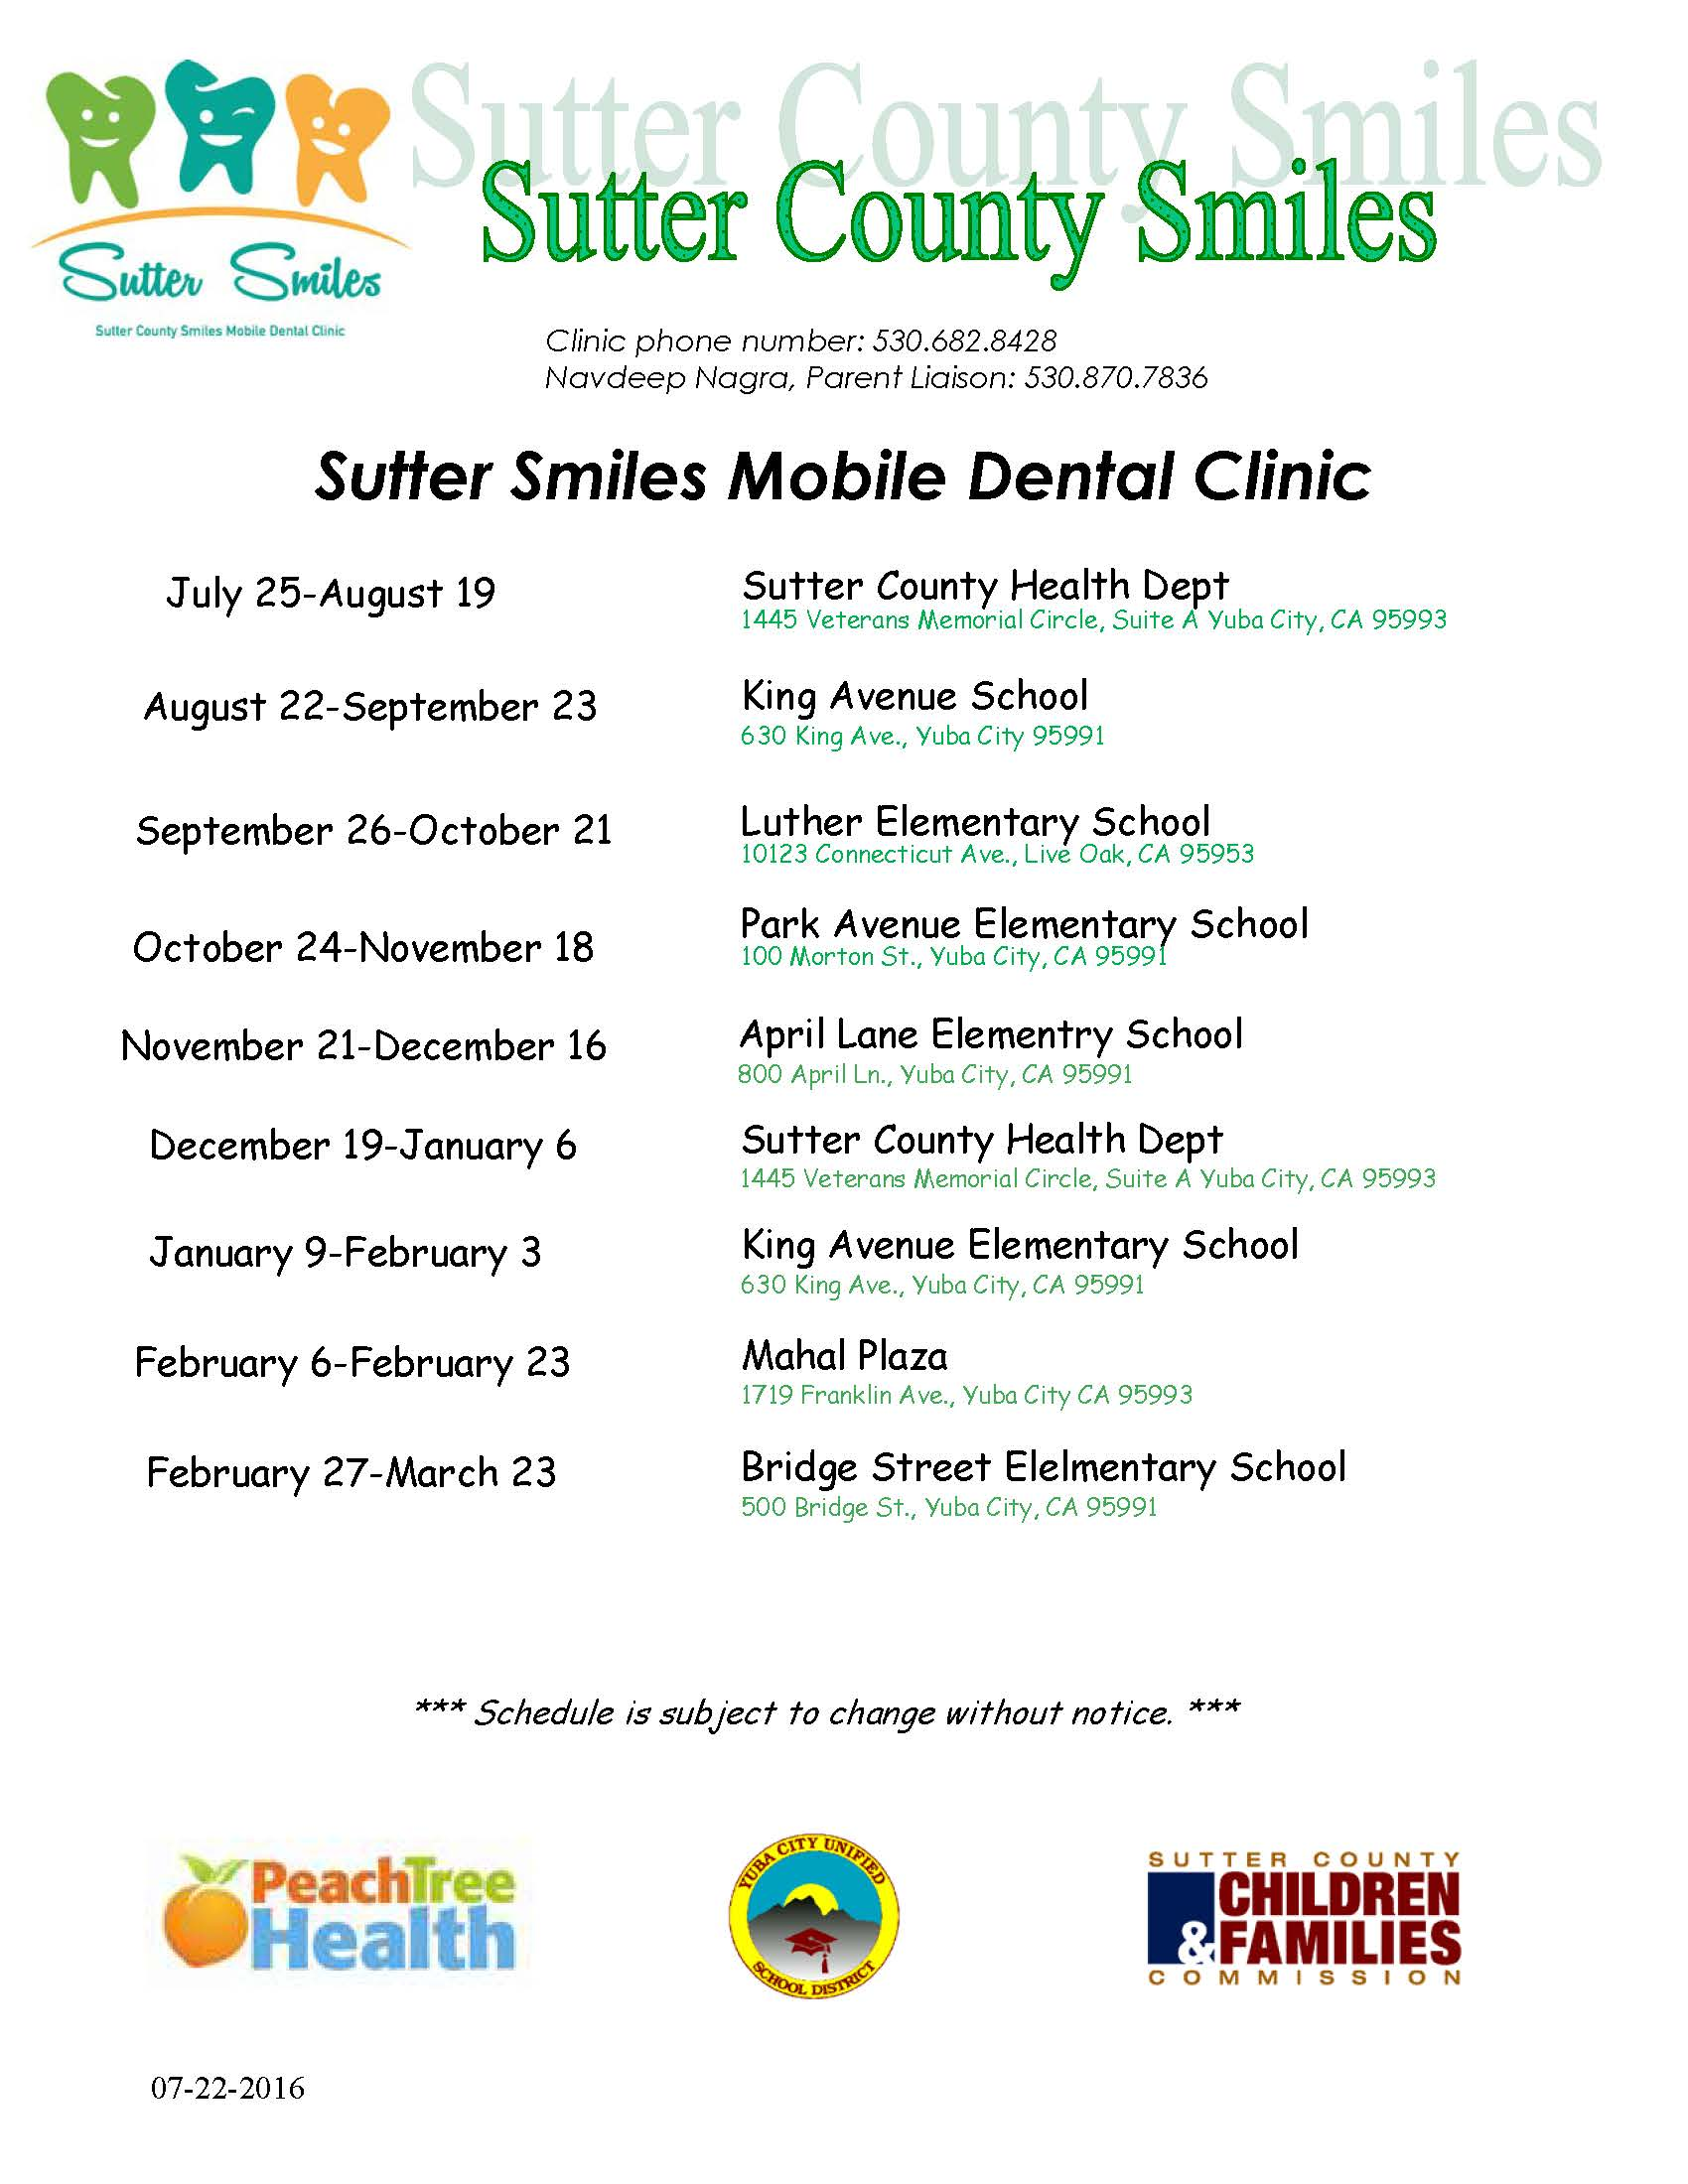 2016 Sutter Smiles Schedule